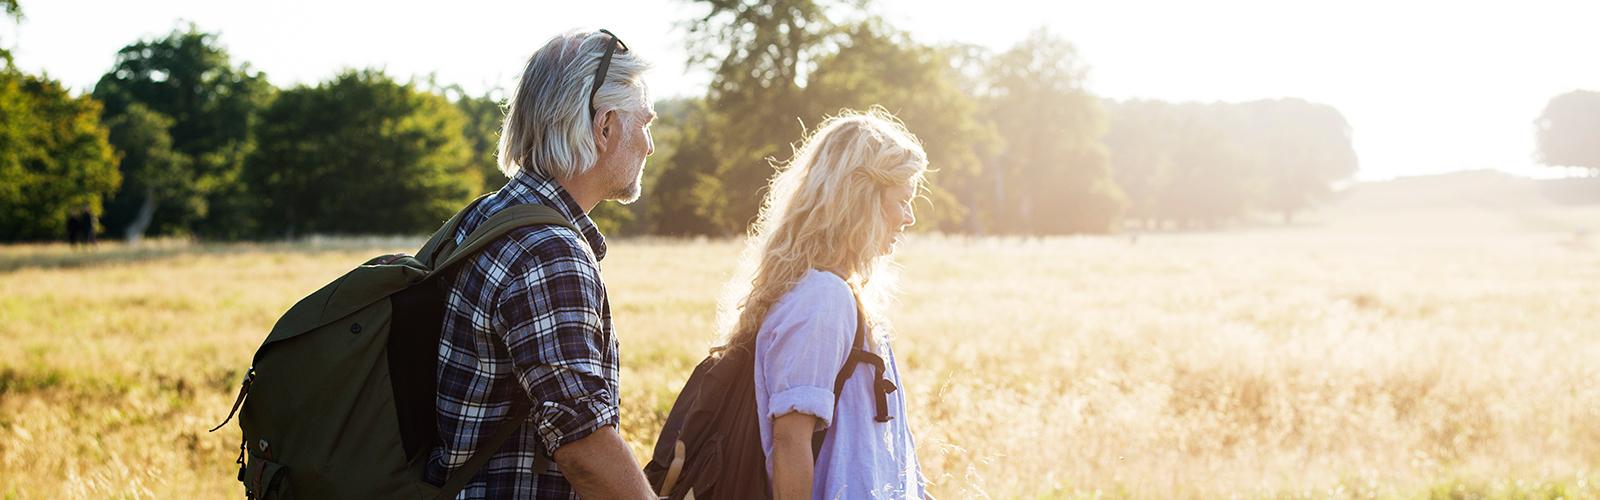 Мужчина и женщина с рюкзаками идут по солнечному полю